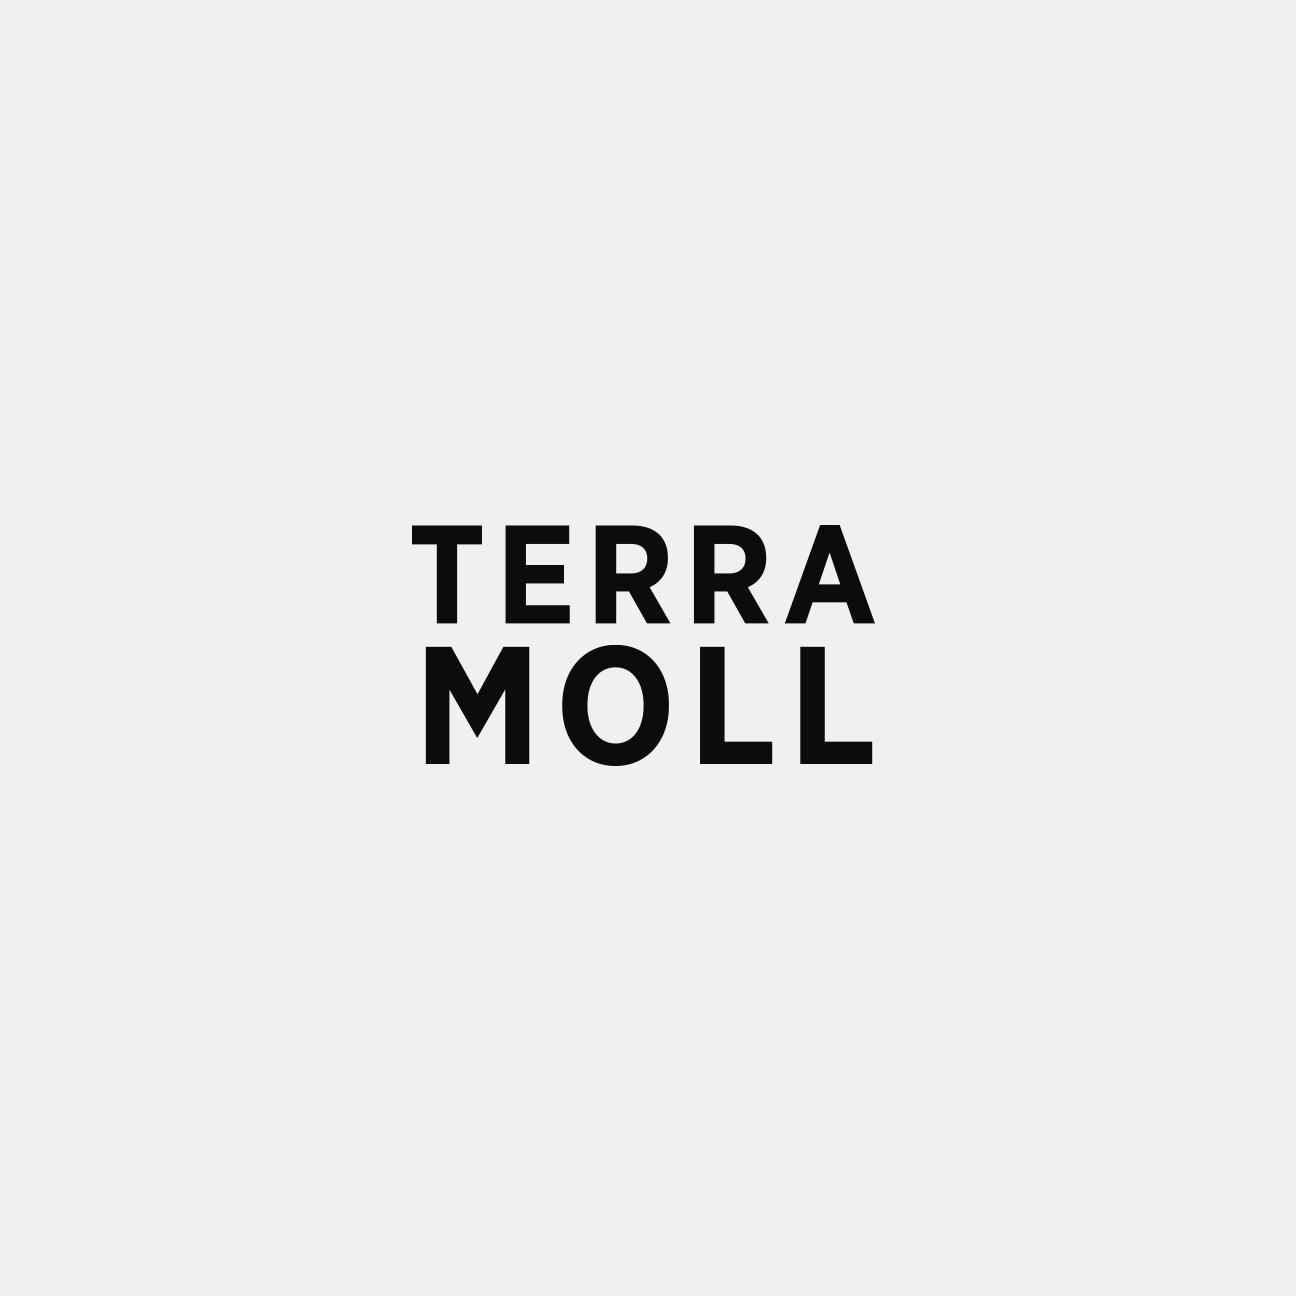 Bodega Terramoll - Diseño de identidad corporativa